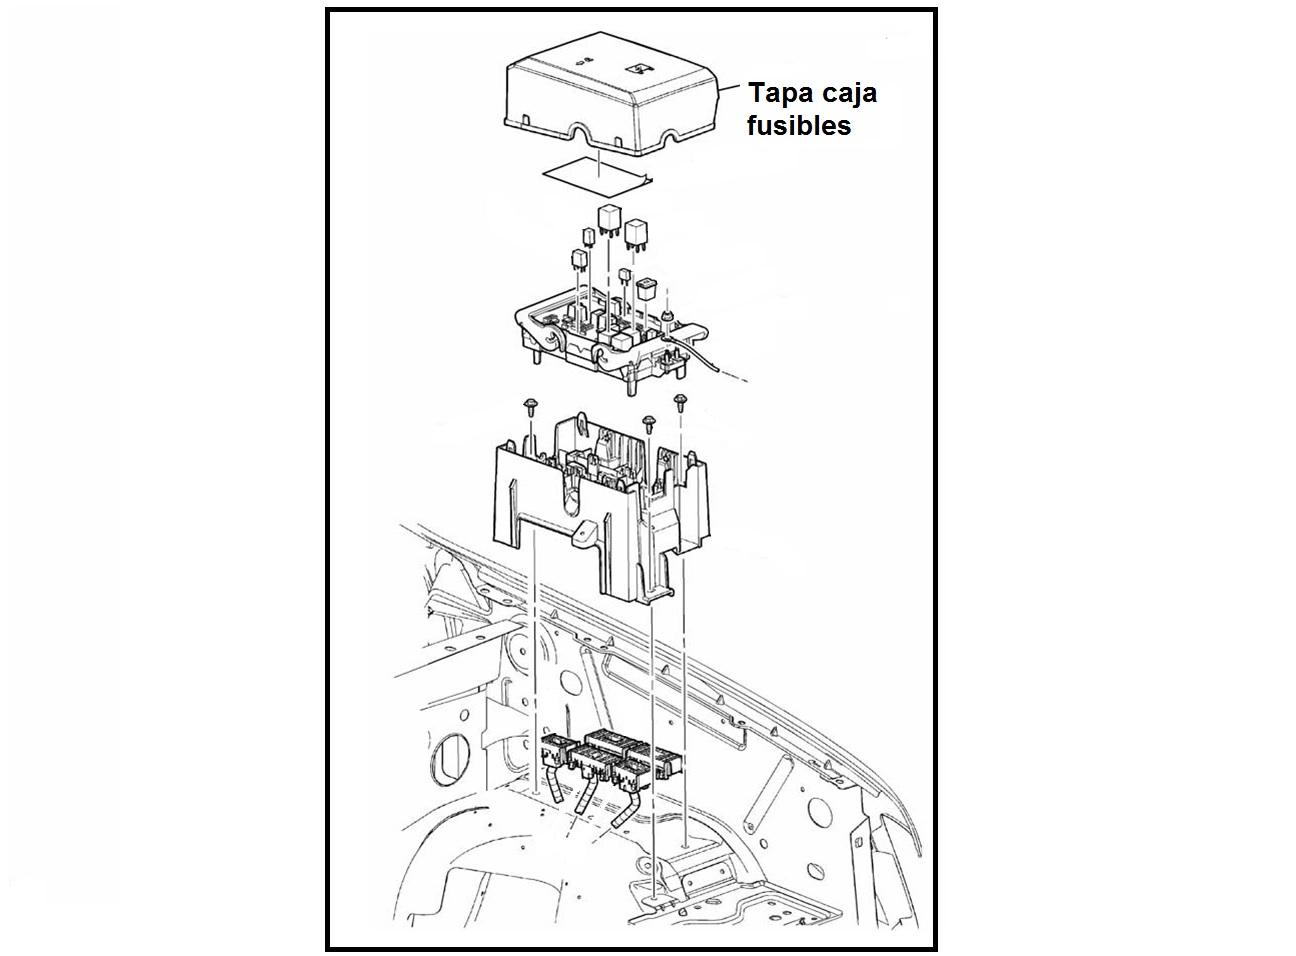 Tapa Caja De Fusibles Chevrolet Avalanche